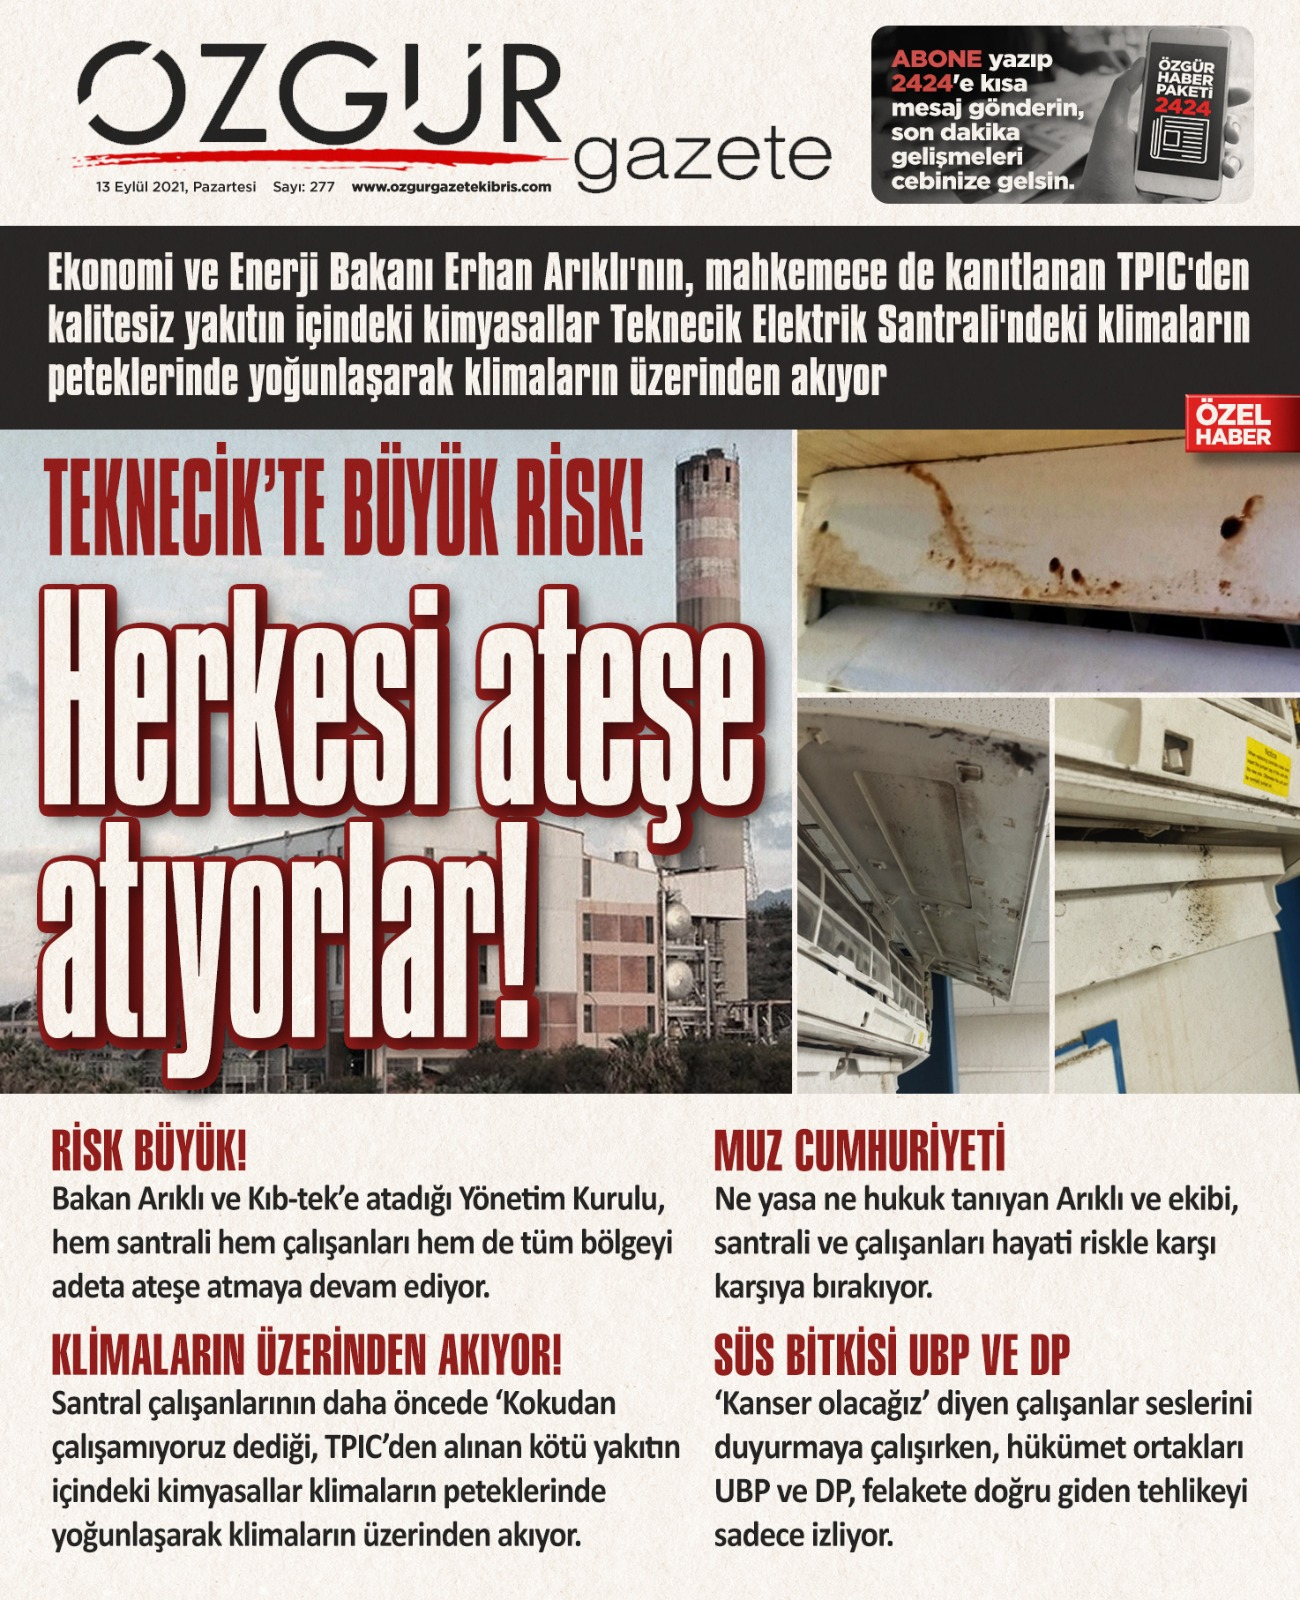 ozgur_gazete_kibris_manset_teknecik